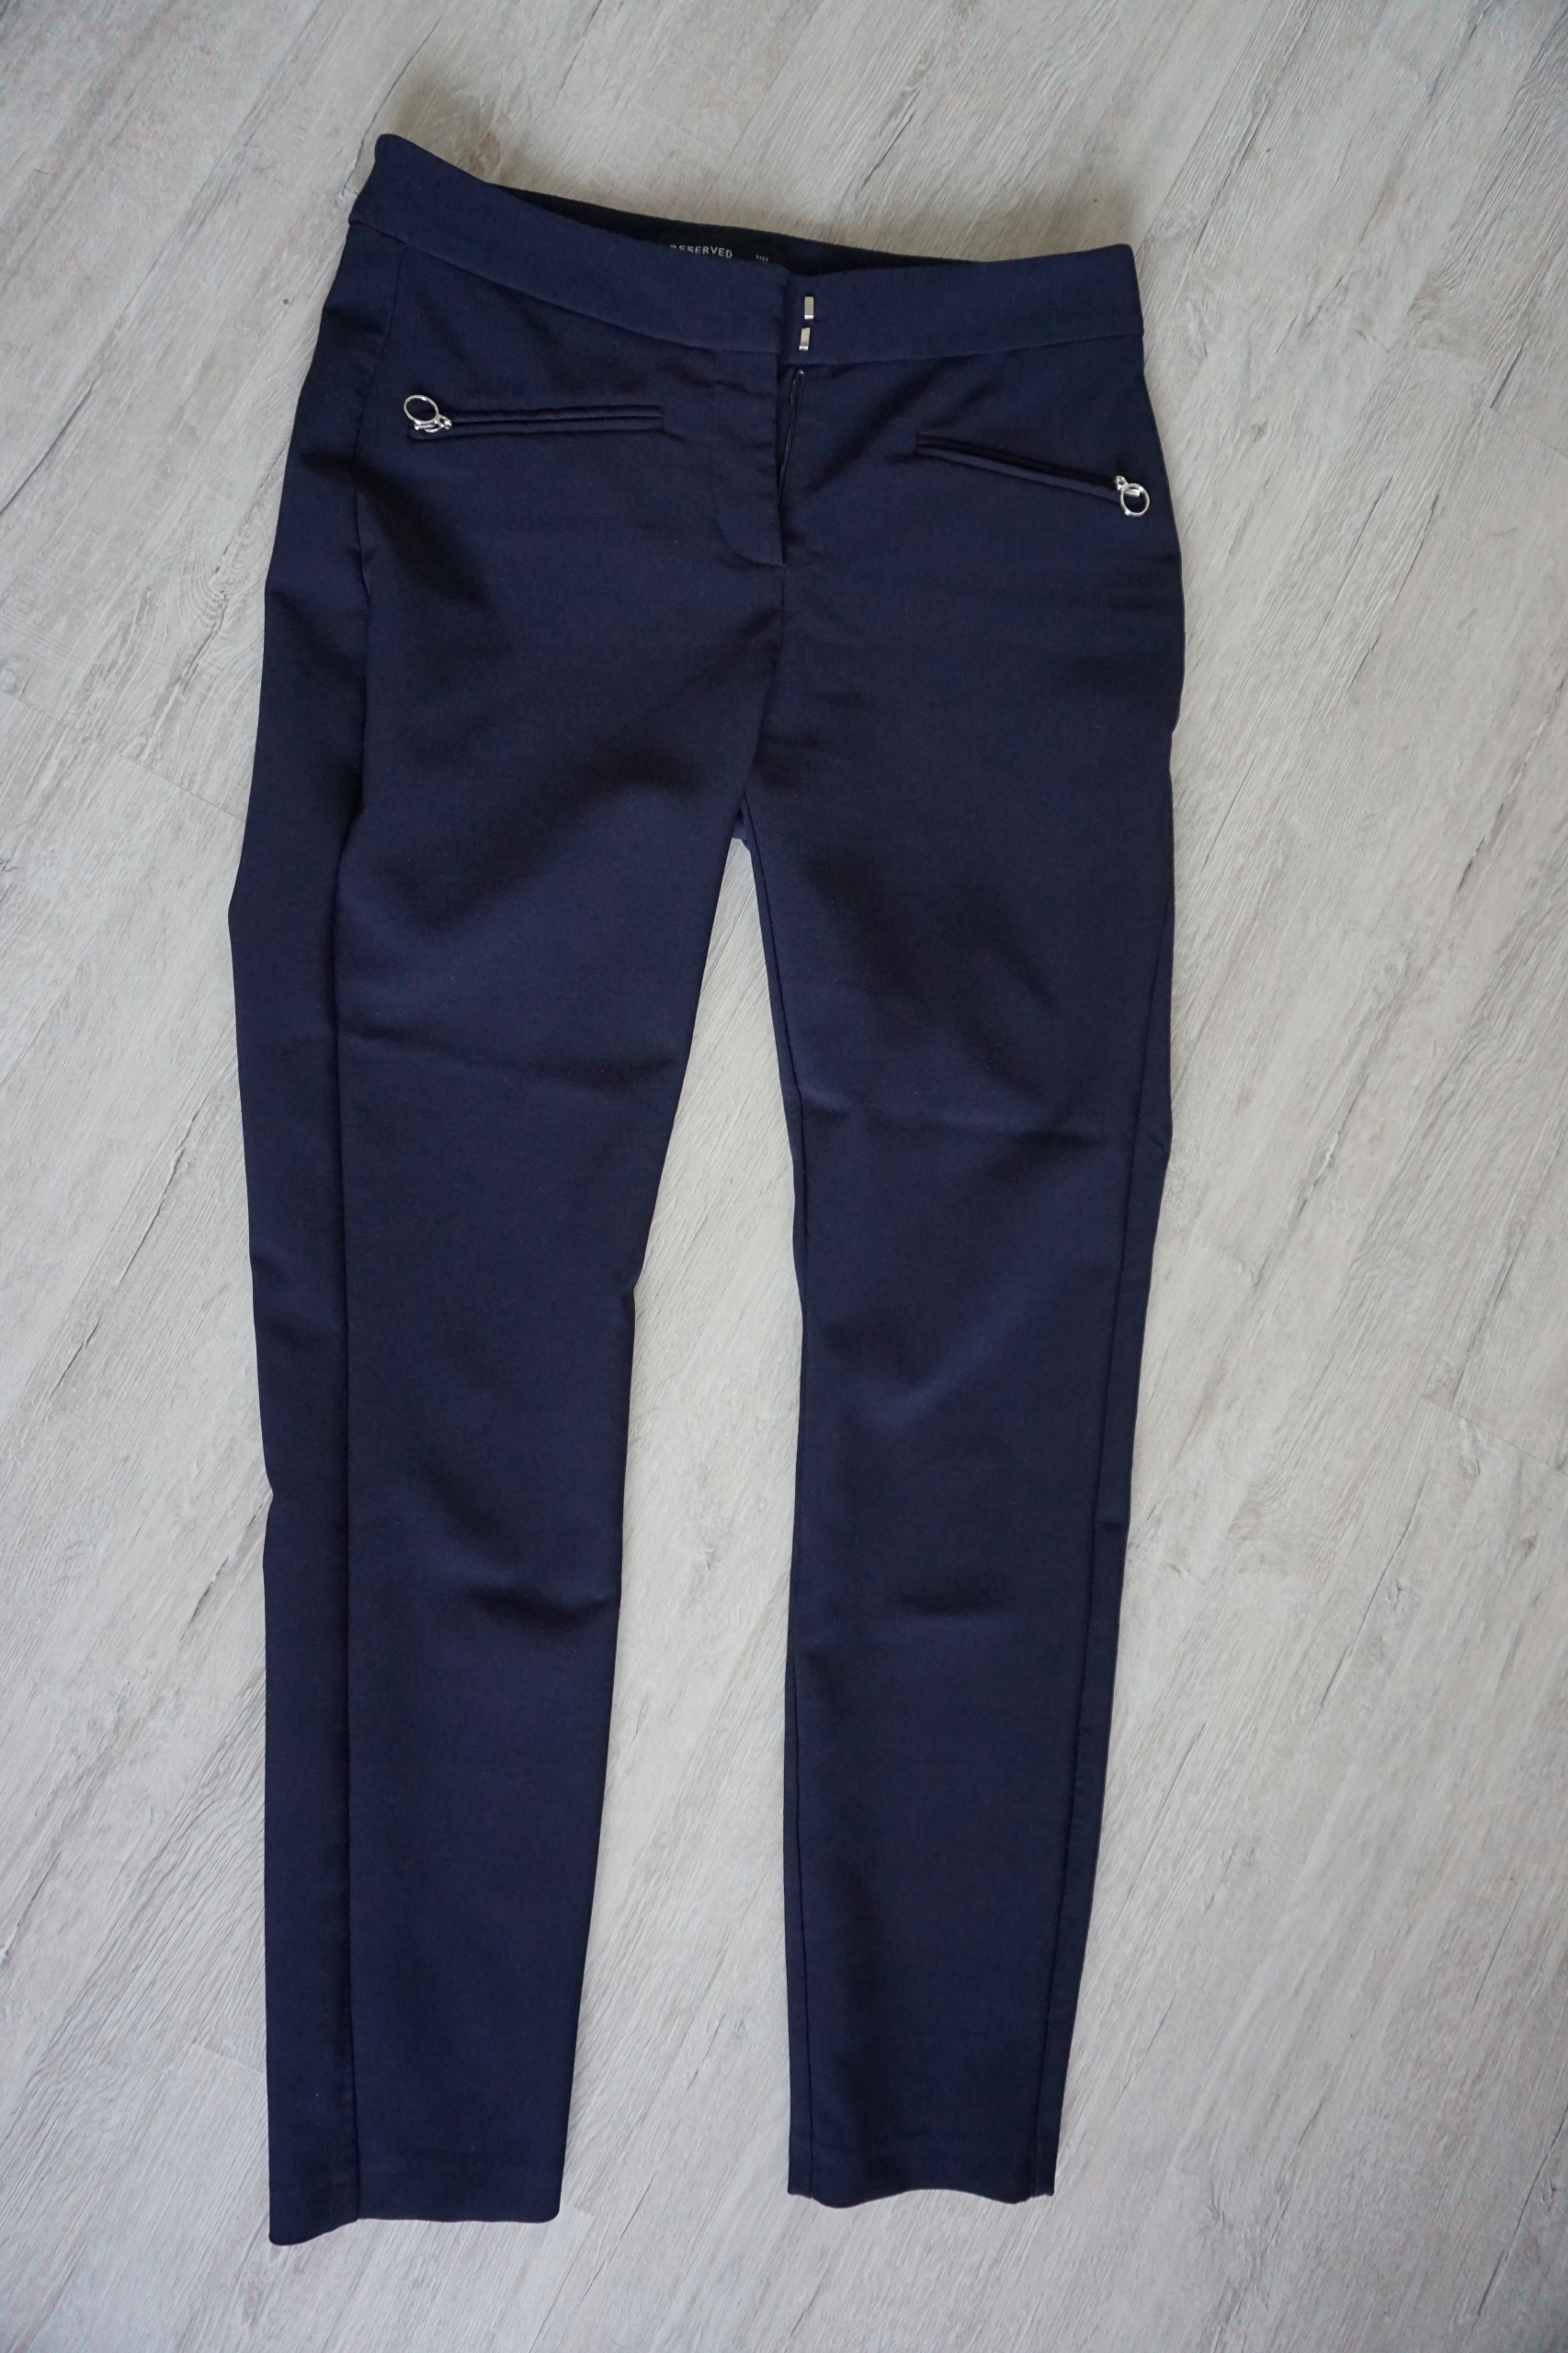 6057a9fc0b1ecf Spodnie damskie granatowe eleganckie RESERVED r.34 - 7648619974 ...